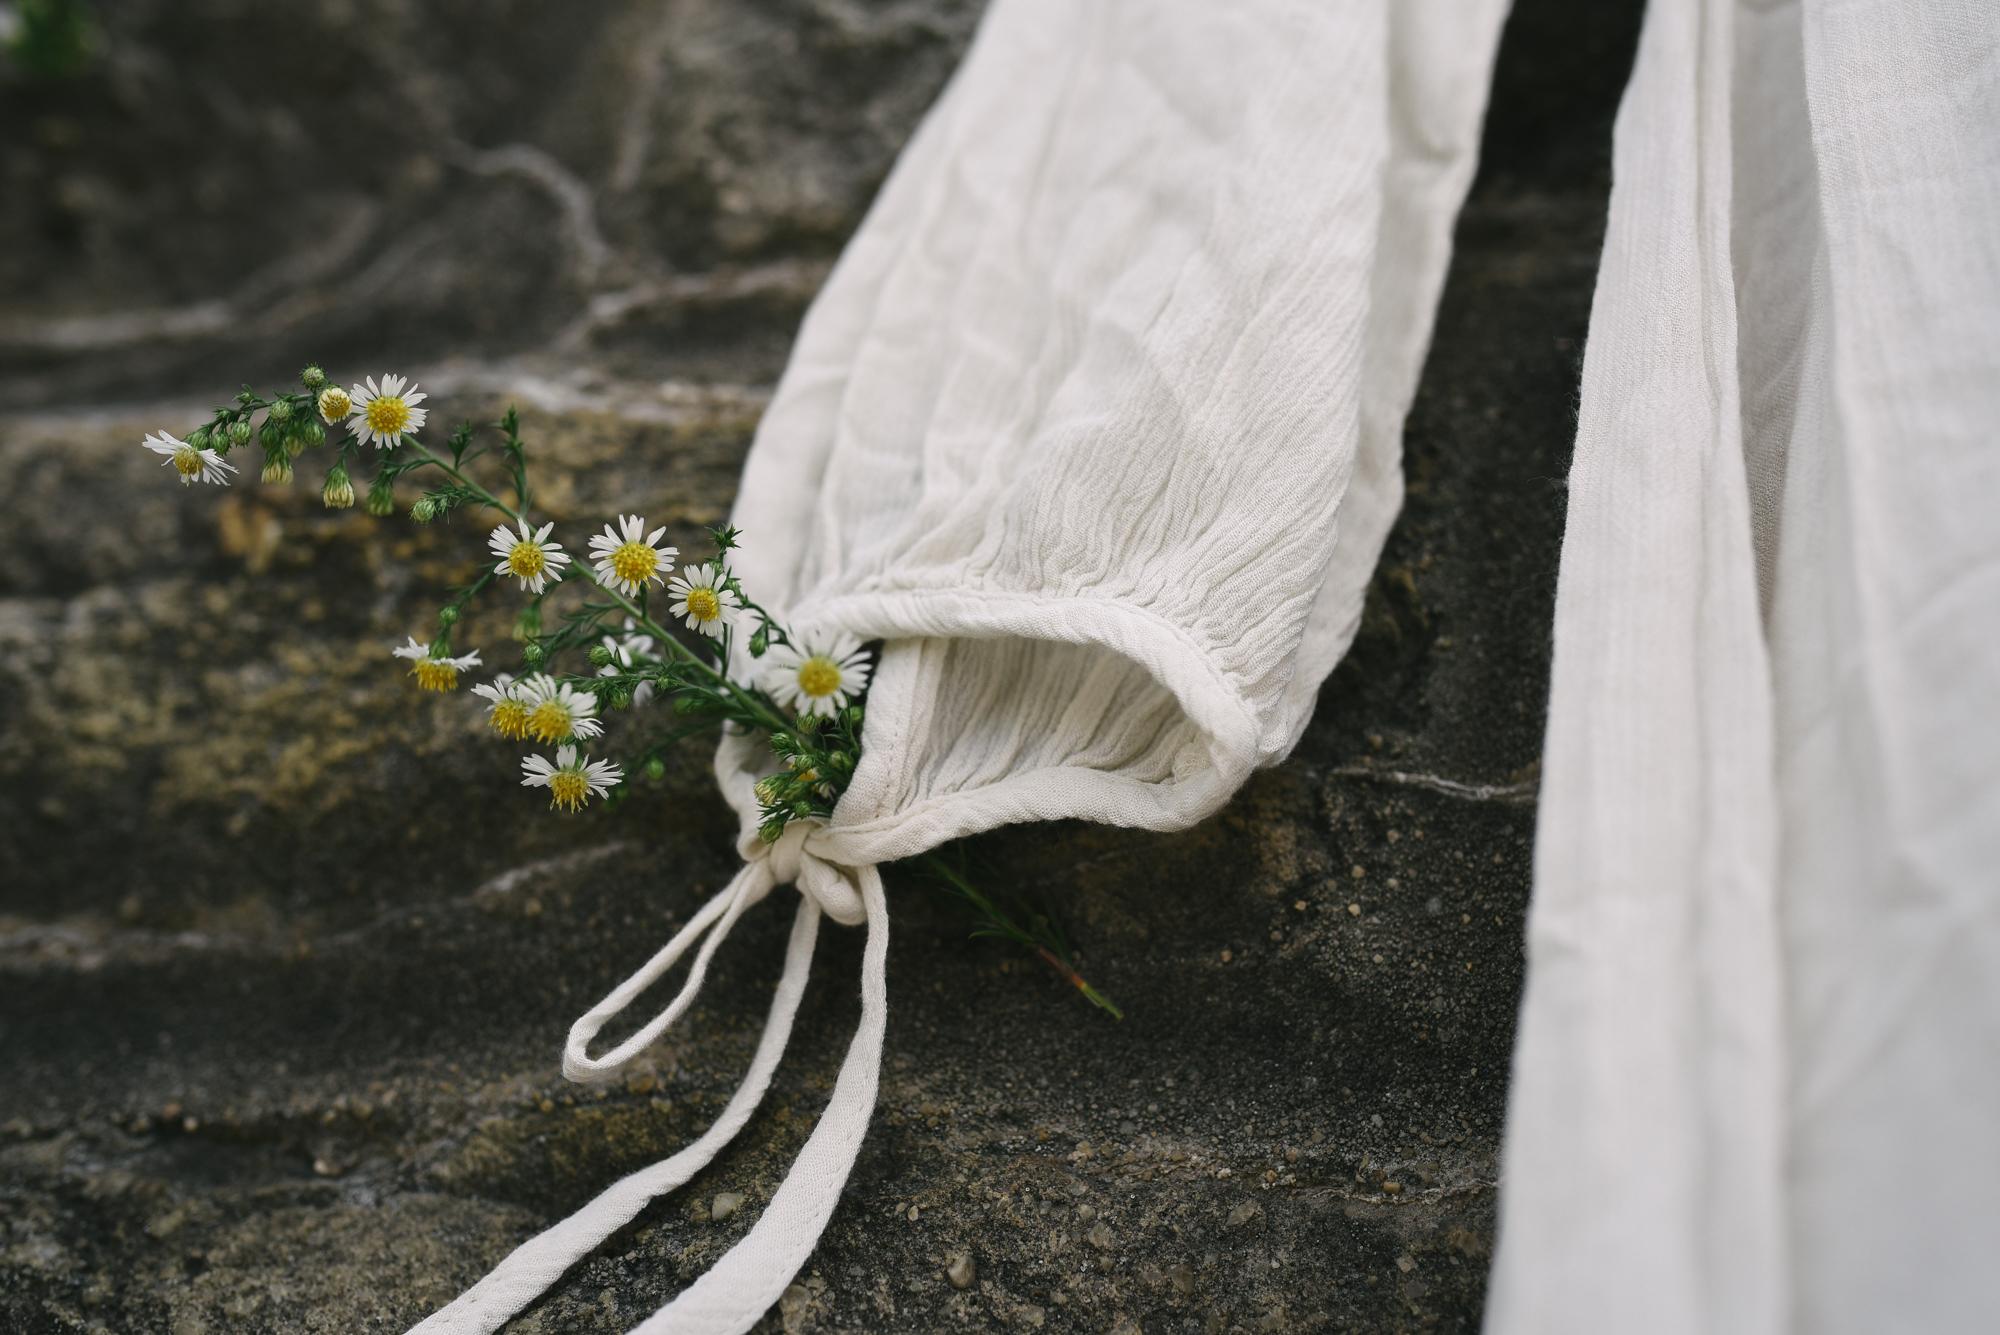 Mountain Wedding, Outdoors, Rustic, West Virginia, Maryland Wedding Photographer, DIY, Daisies with Wedding Dress